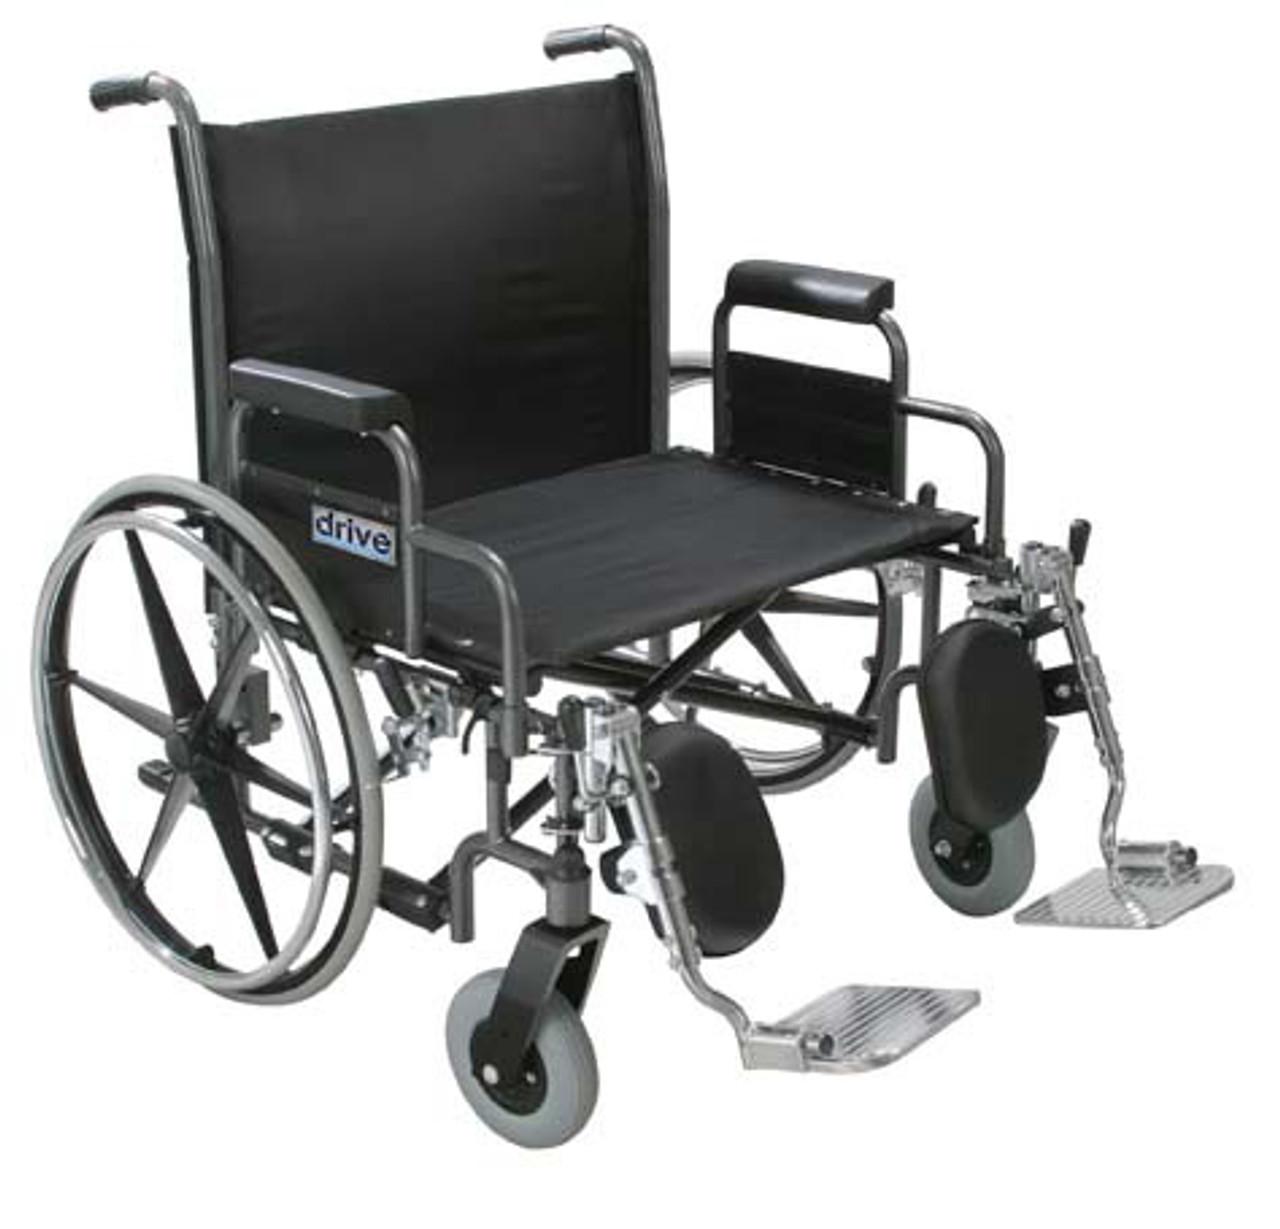 Drive Sentra Heavy Duty Wheel Chair